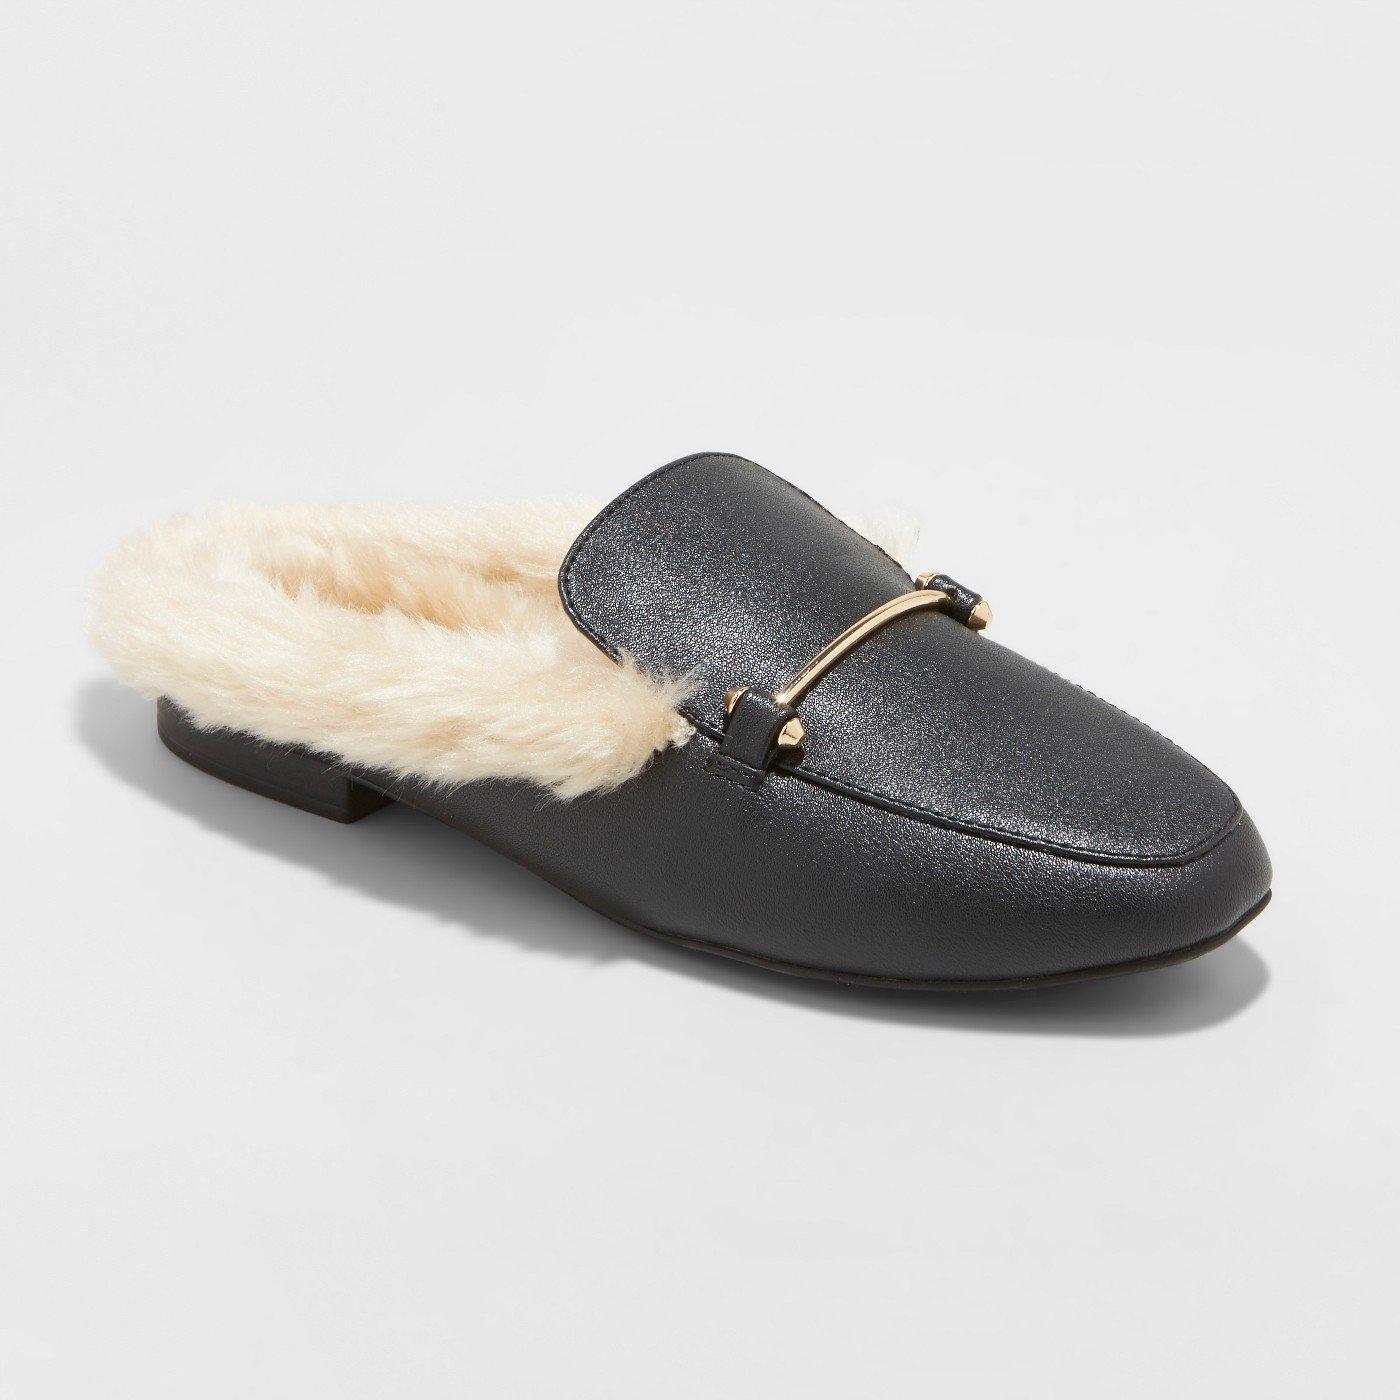 woman leather fur mule slides - so cute!